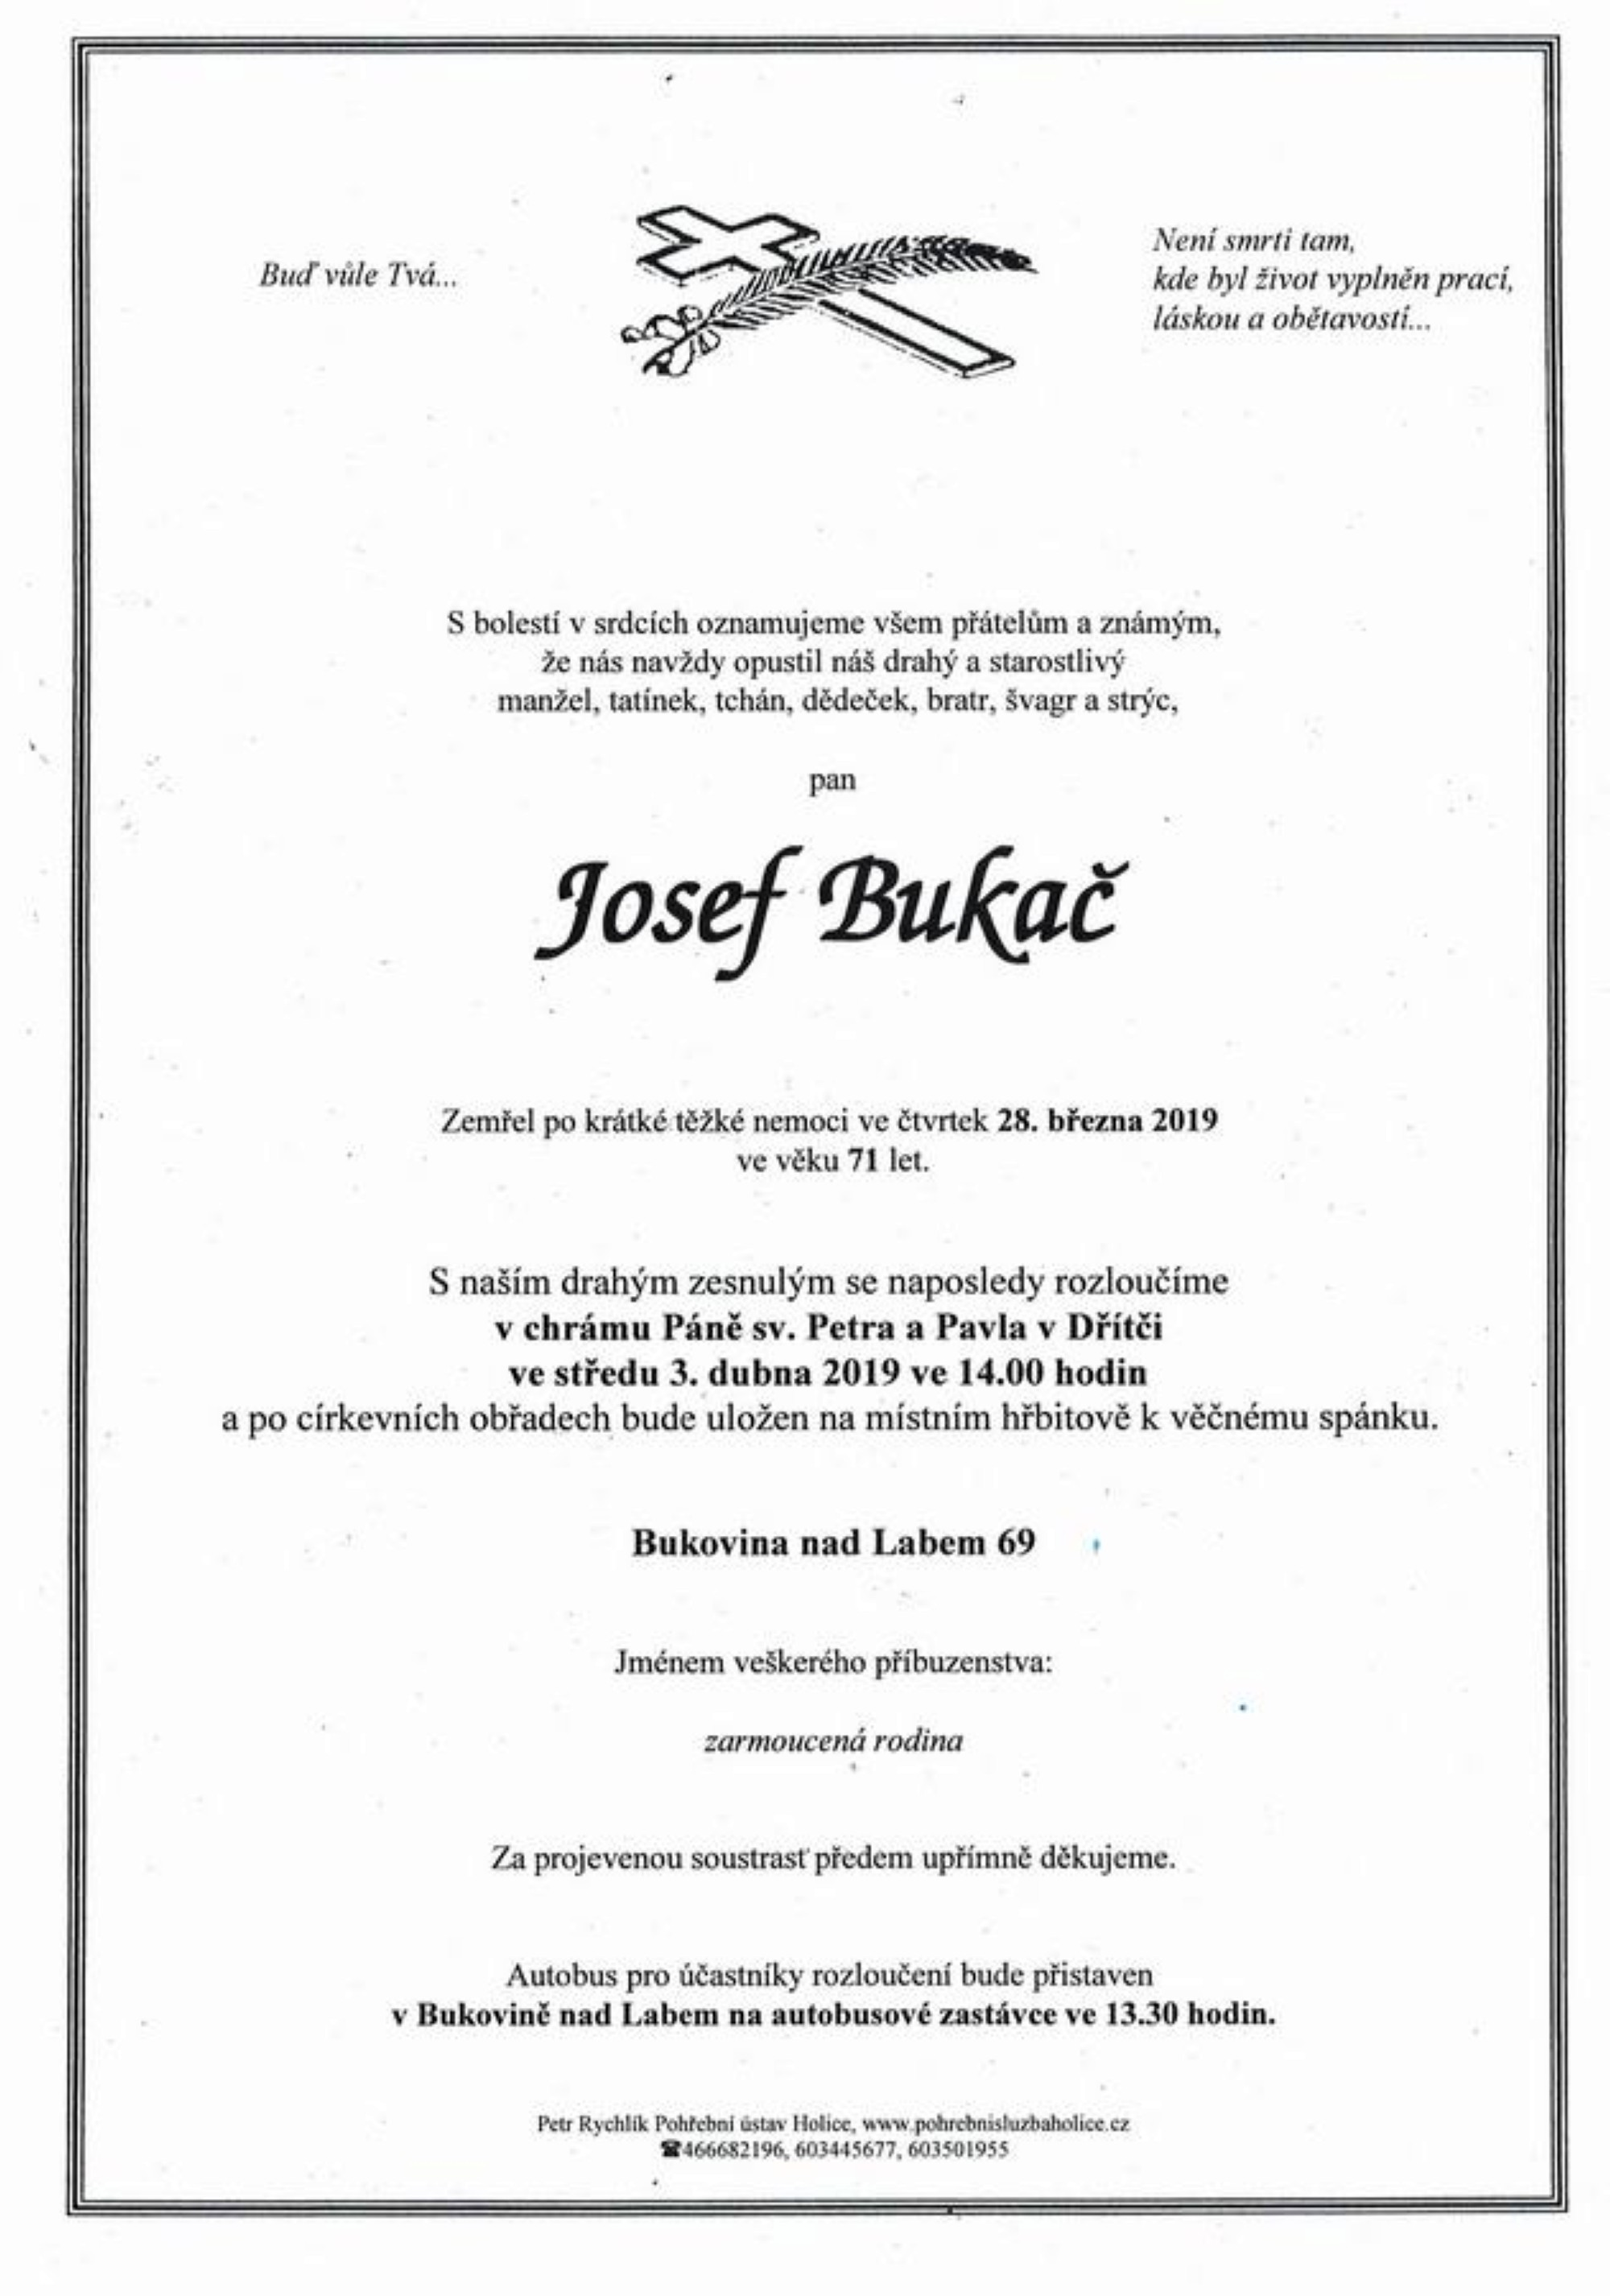 Josef Bukač